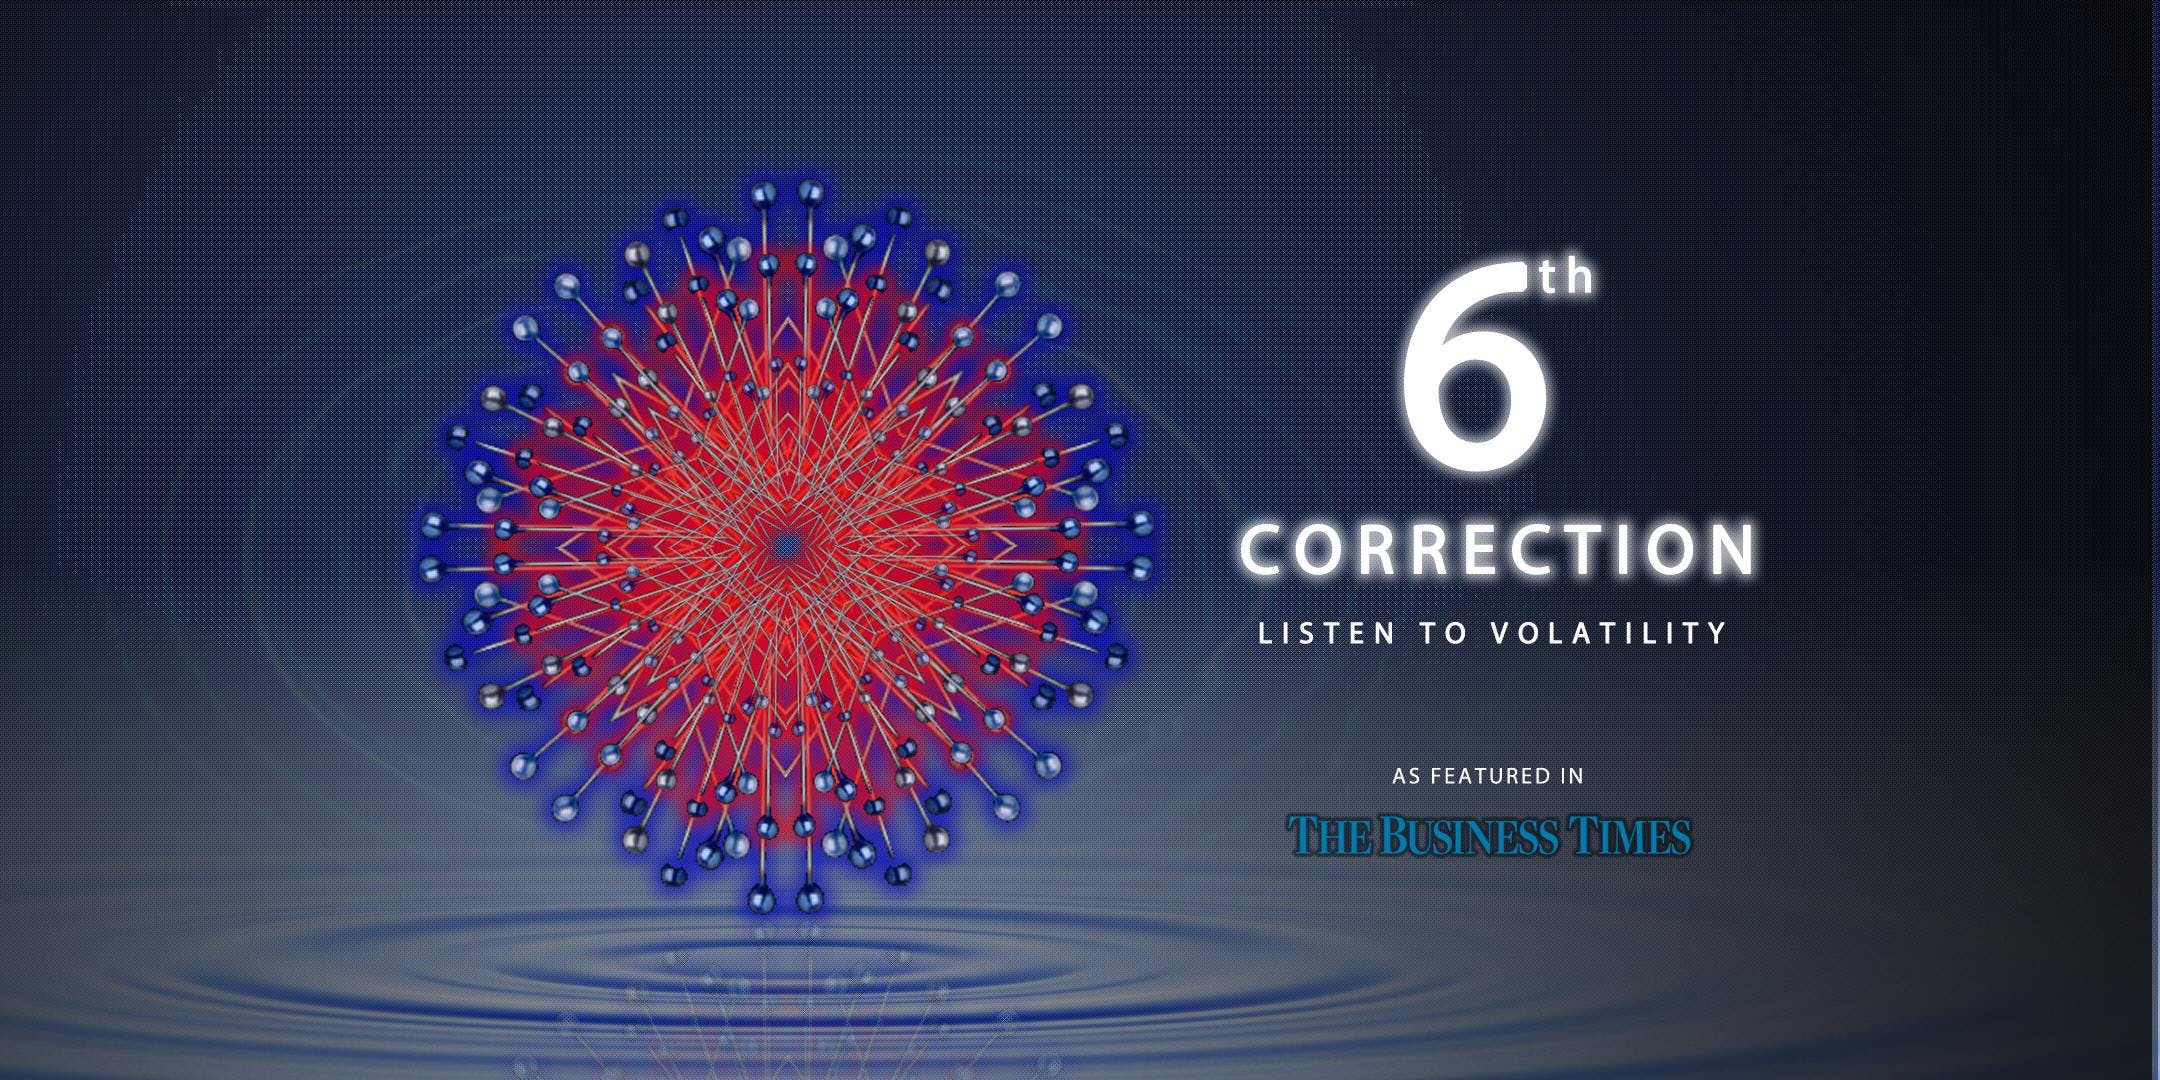 6th CORRECTION -Listen to Volatility